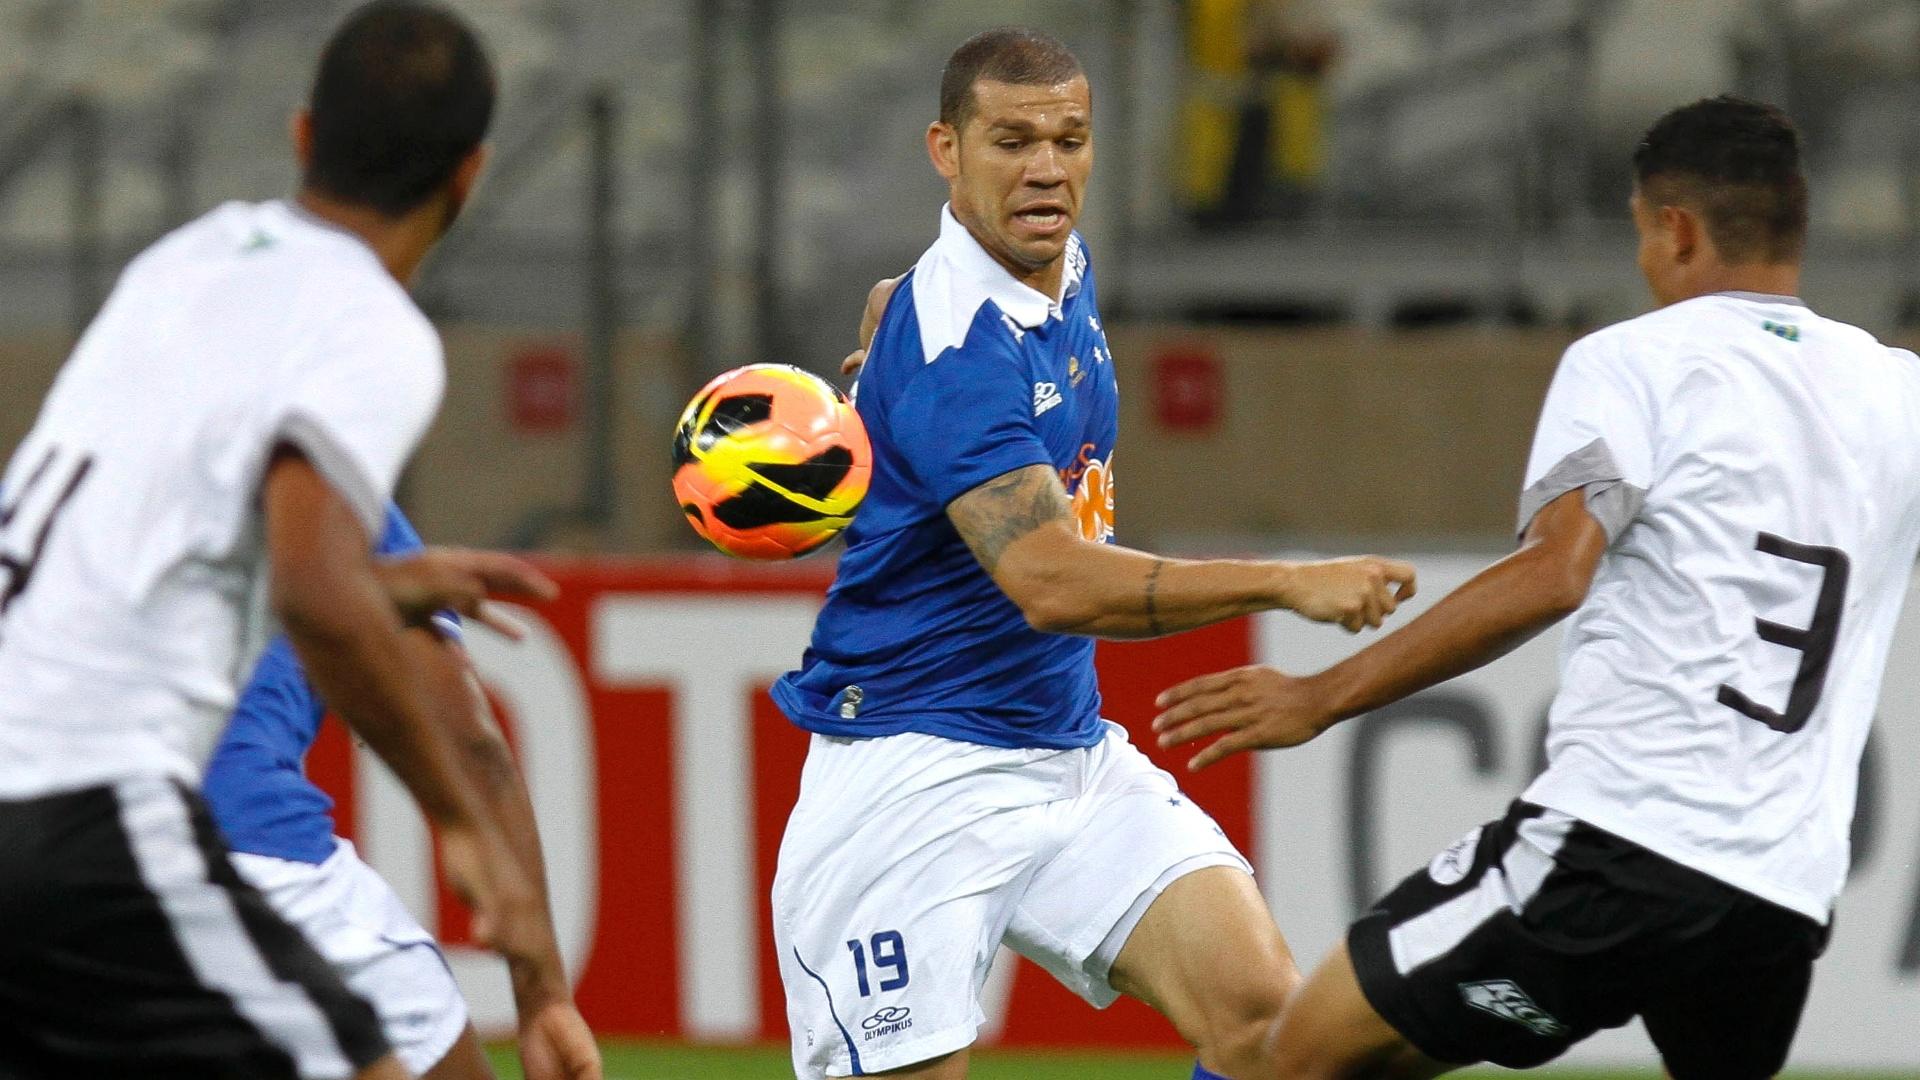 Nilton durante a goleada do Cruzeiro sobre o Resende, por 4 a 0, pela Copa do Brasil (22/5/2013)